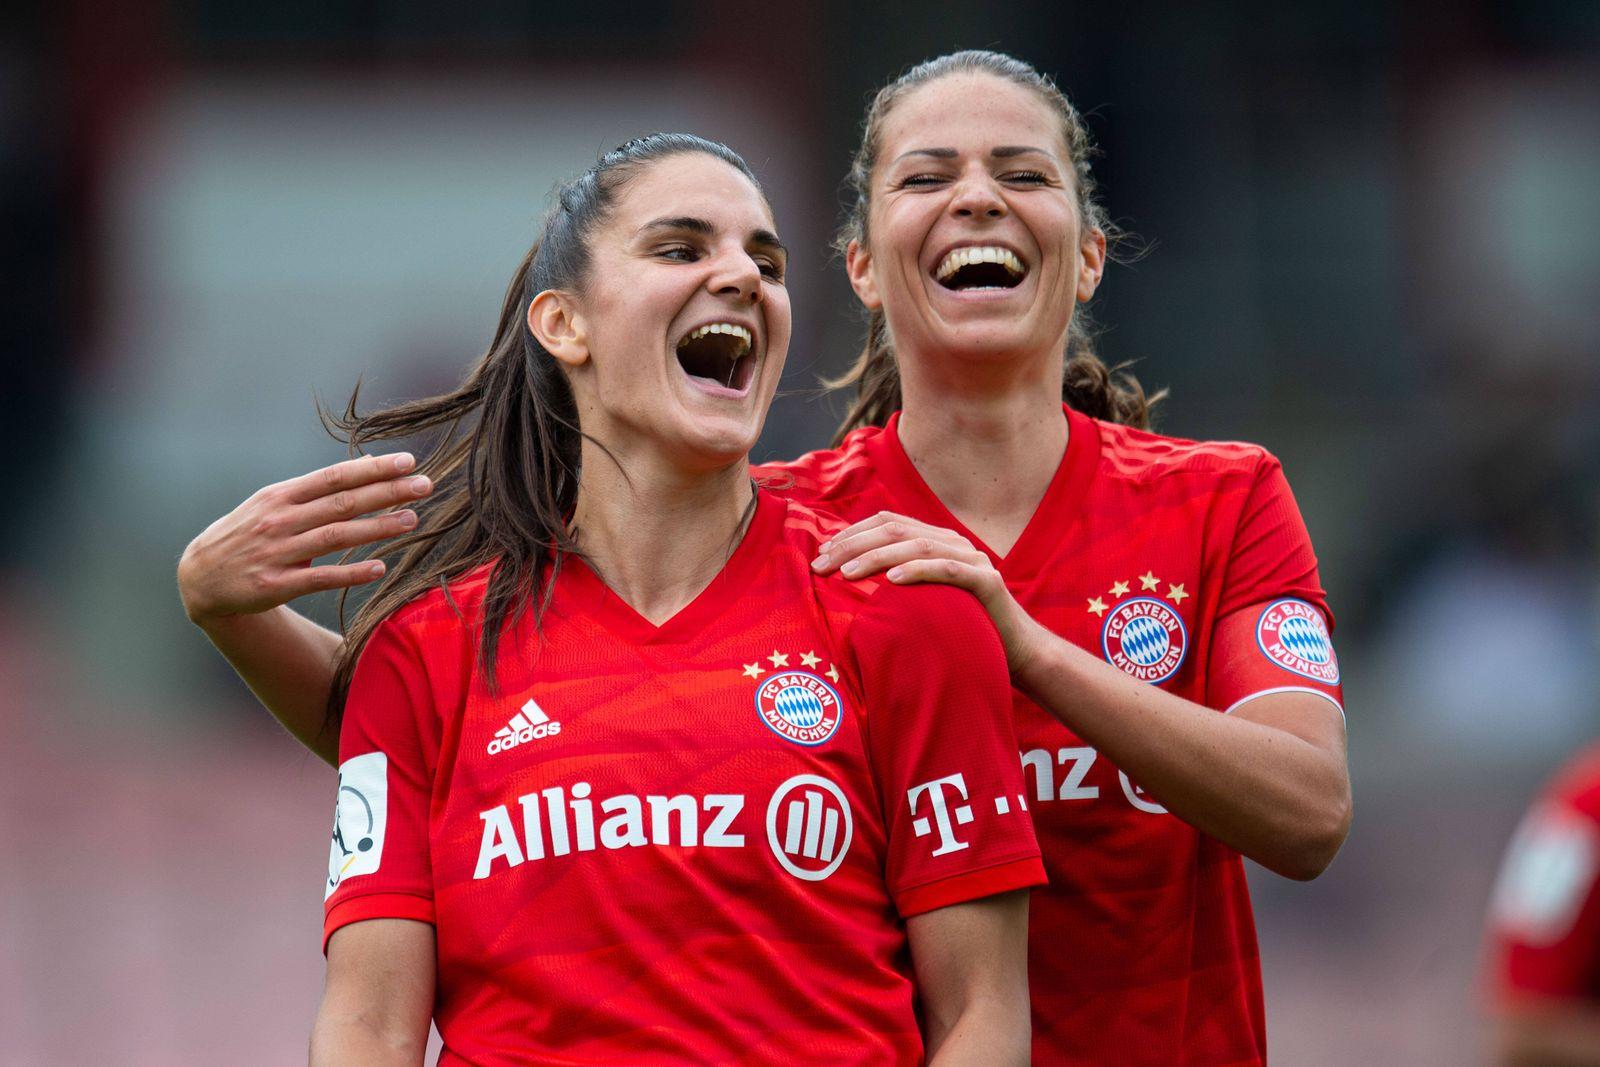 17.06.2020 - Fußball, Frauen Bundesliga, 2019/2020, 20. Spieltag, 1. FC Köln - FC Bayern München: (L-R) Jovana Damnjano